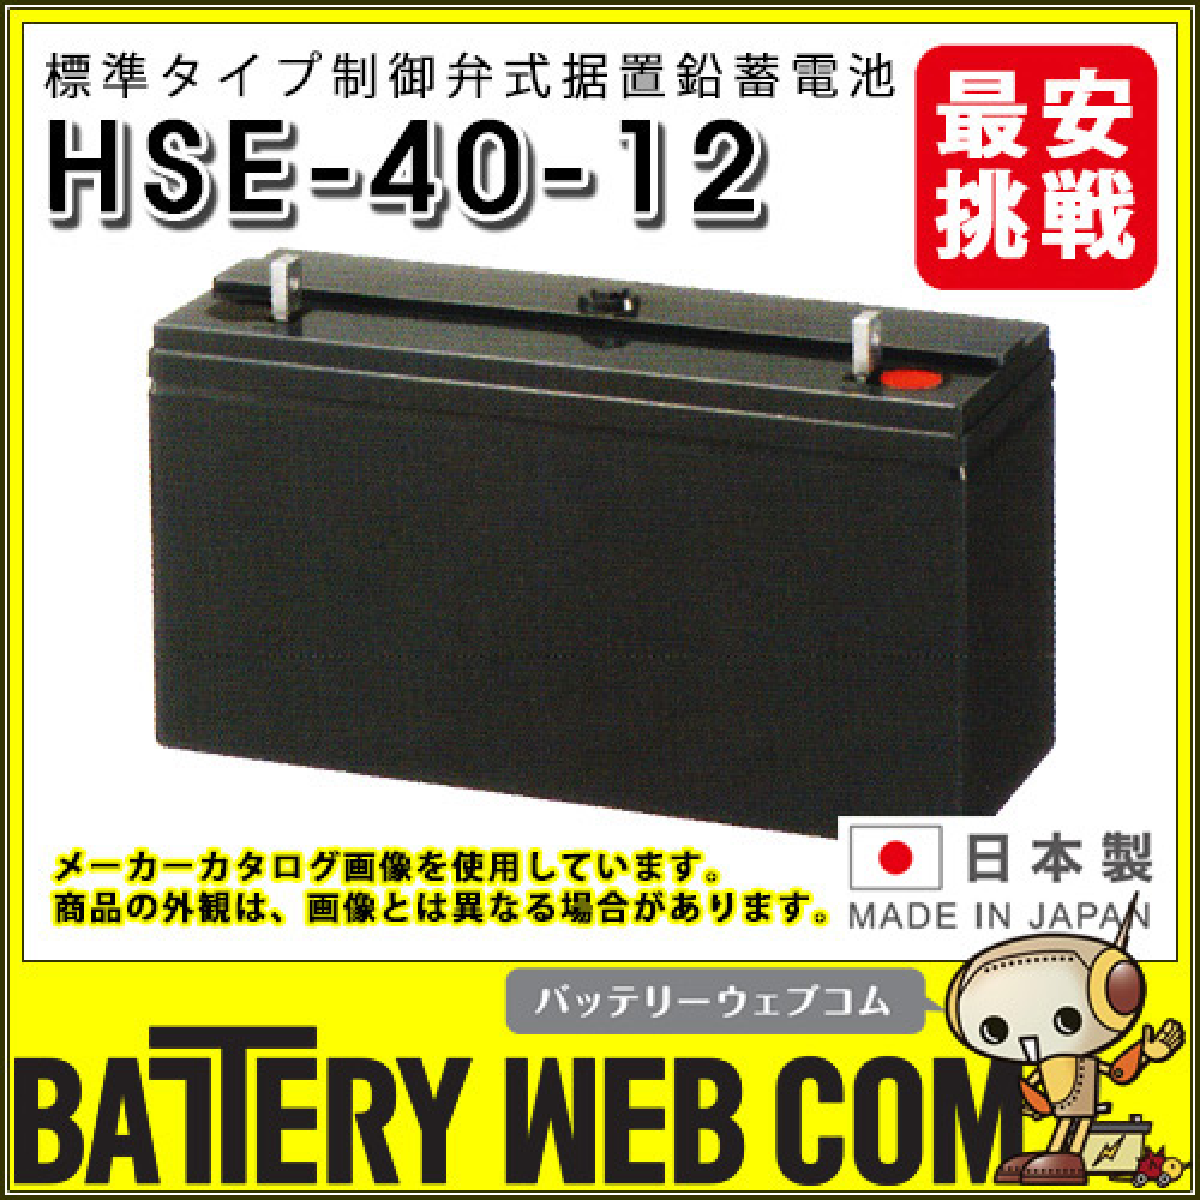 hse-40-12